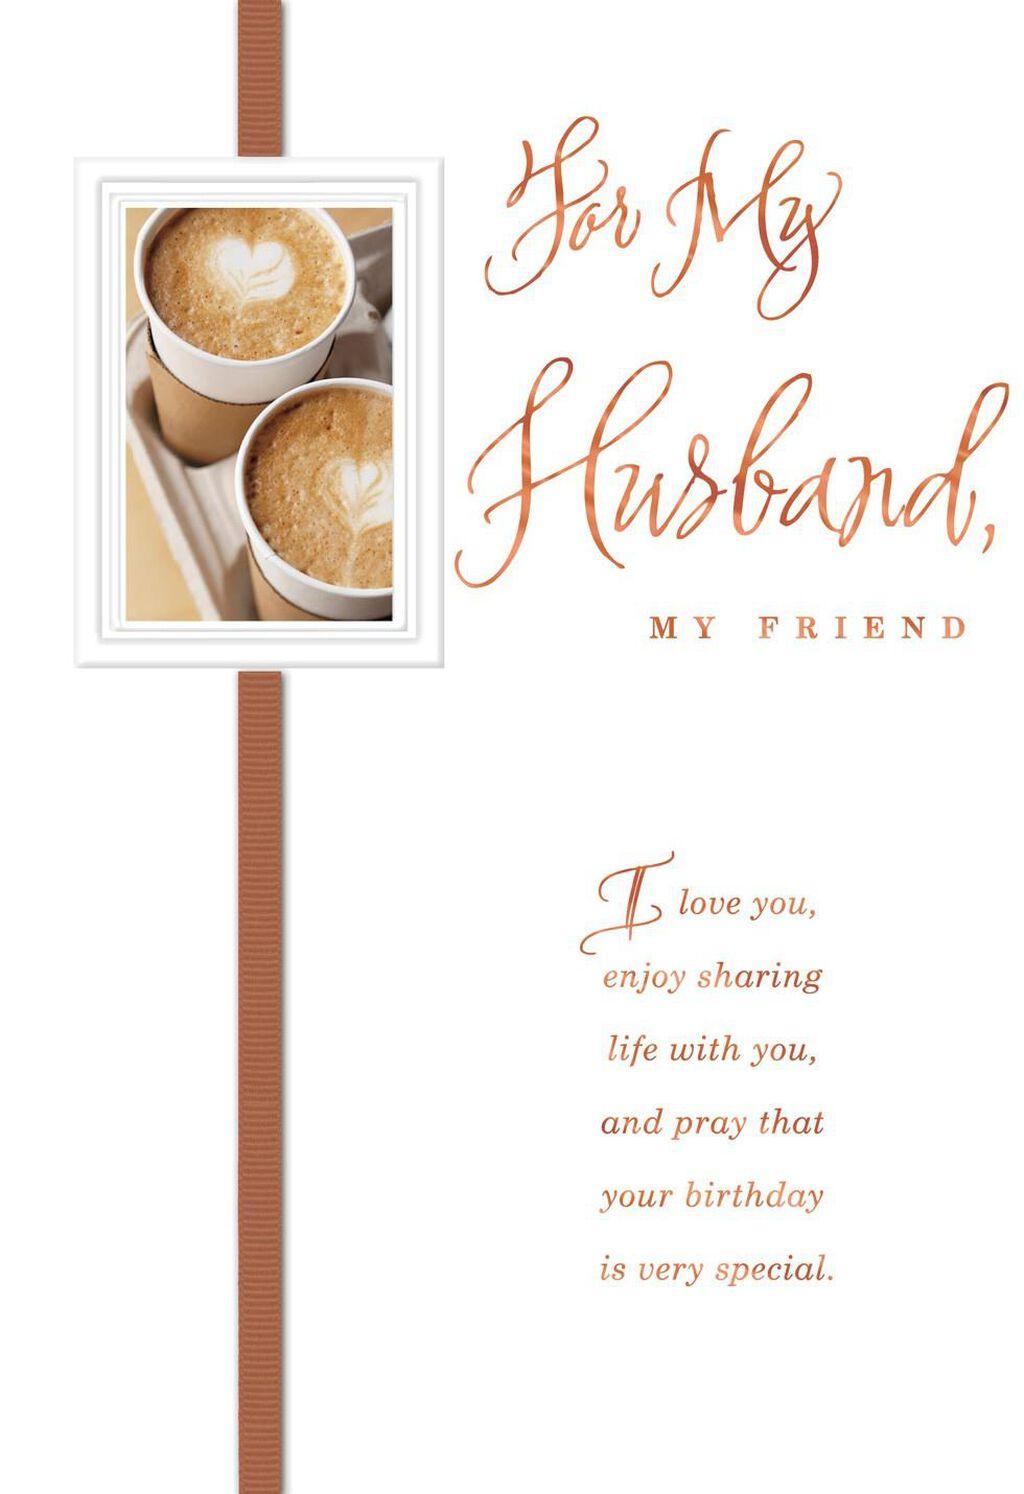 My Husband My Friend Religious Birthday Card Greeting Cards Hallmark